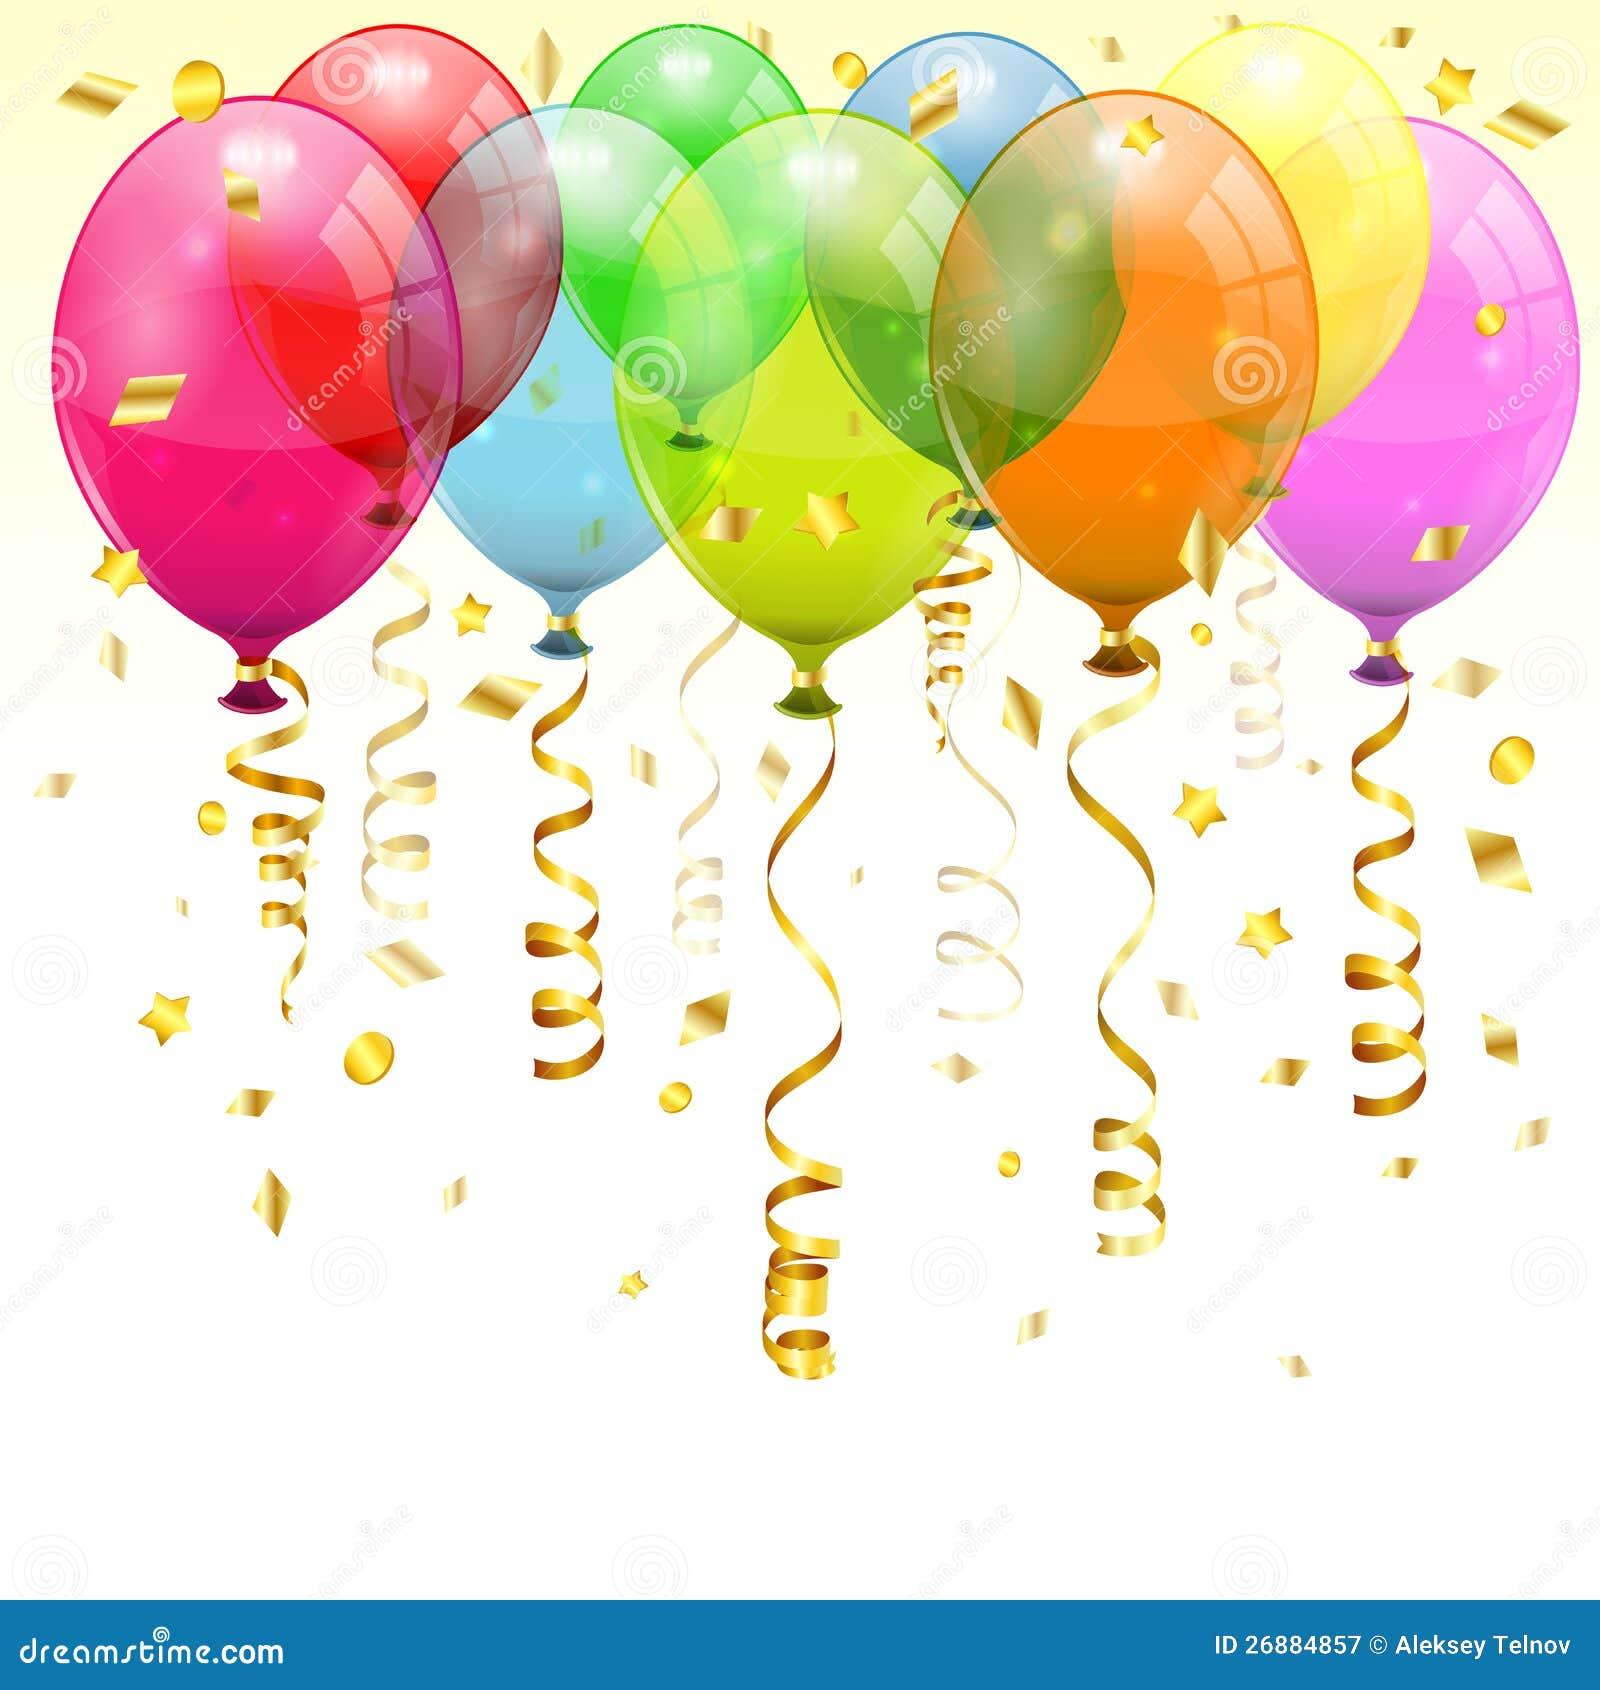 geburtstag ballone vektor abbildung illustration von ballone 26884857 Happy Birthday Animations Free Download Happy Birthday Images Free Download